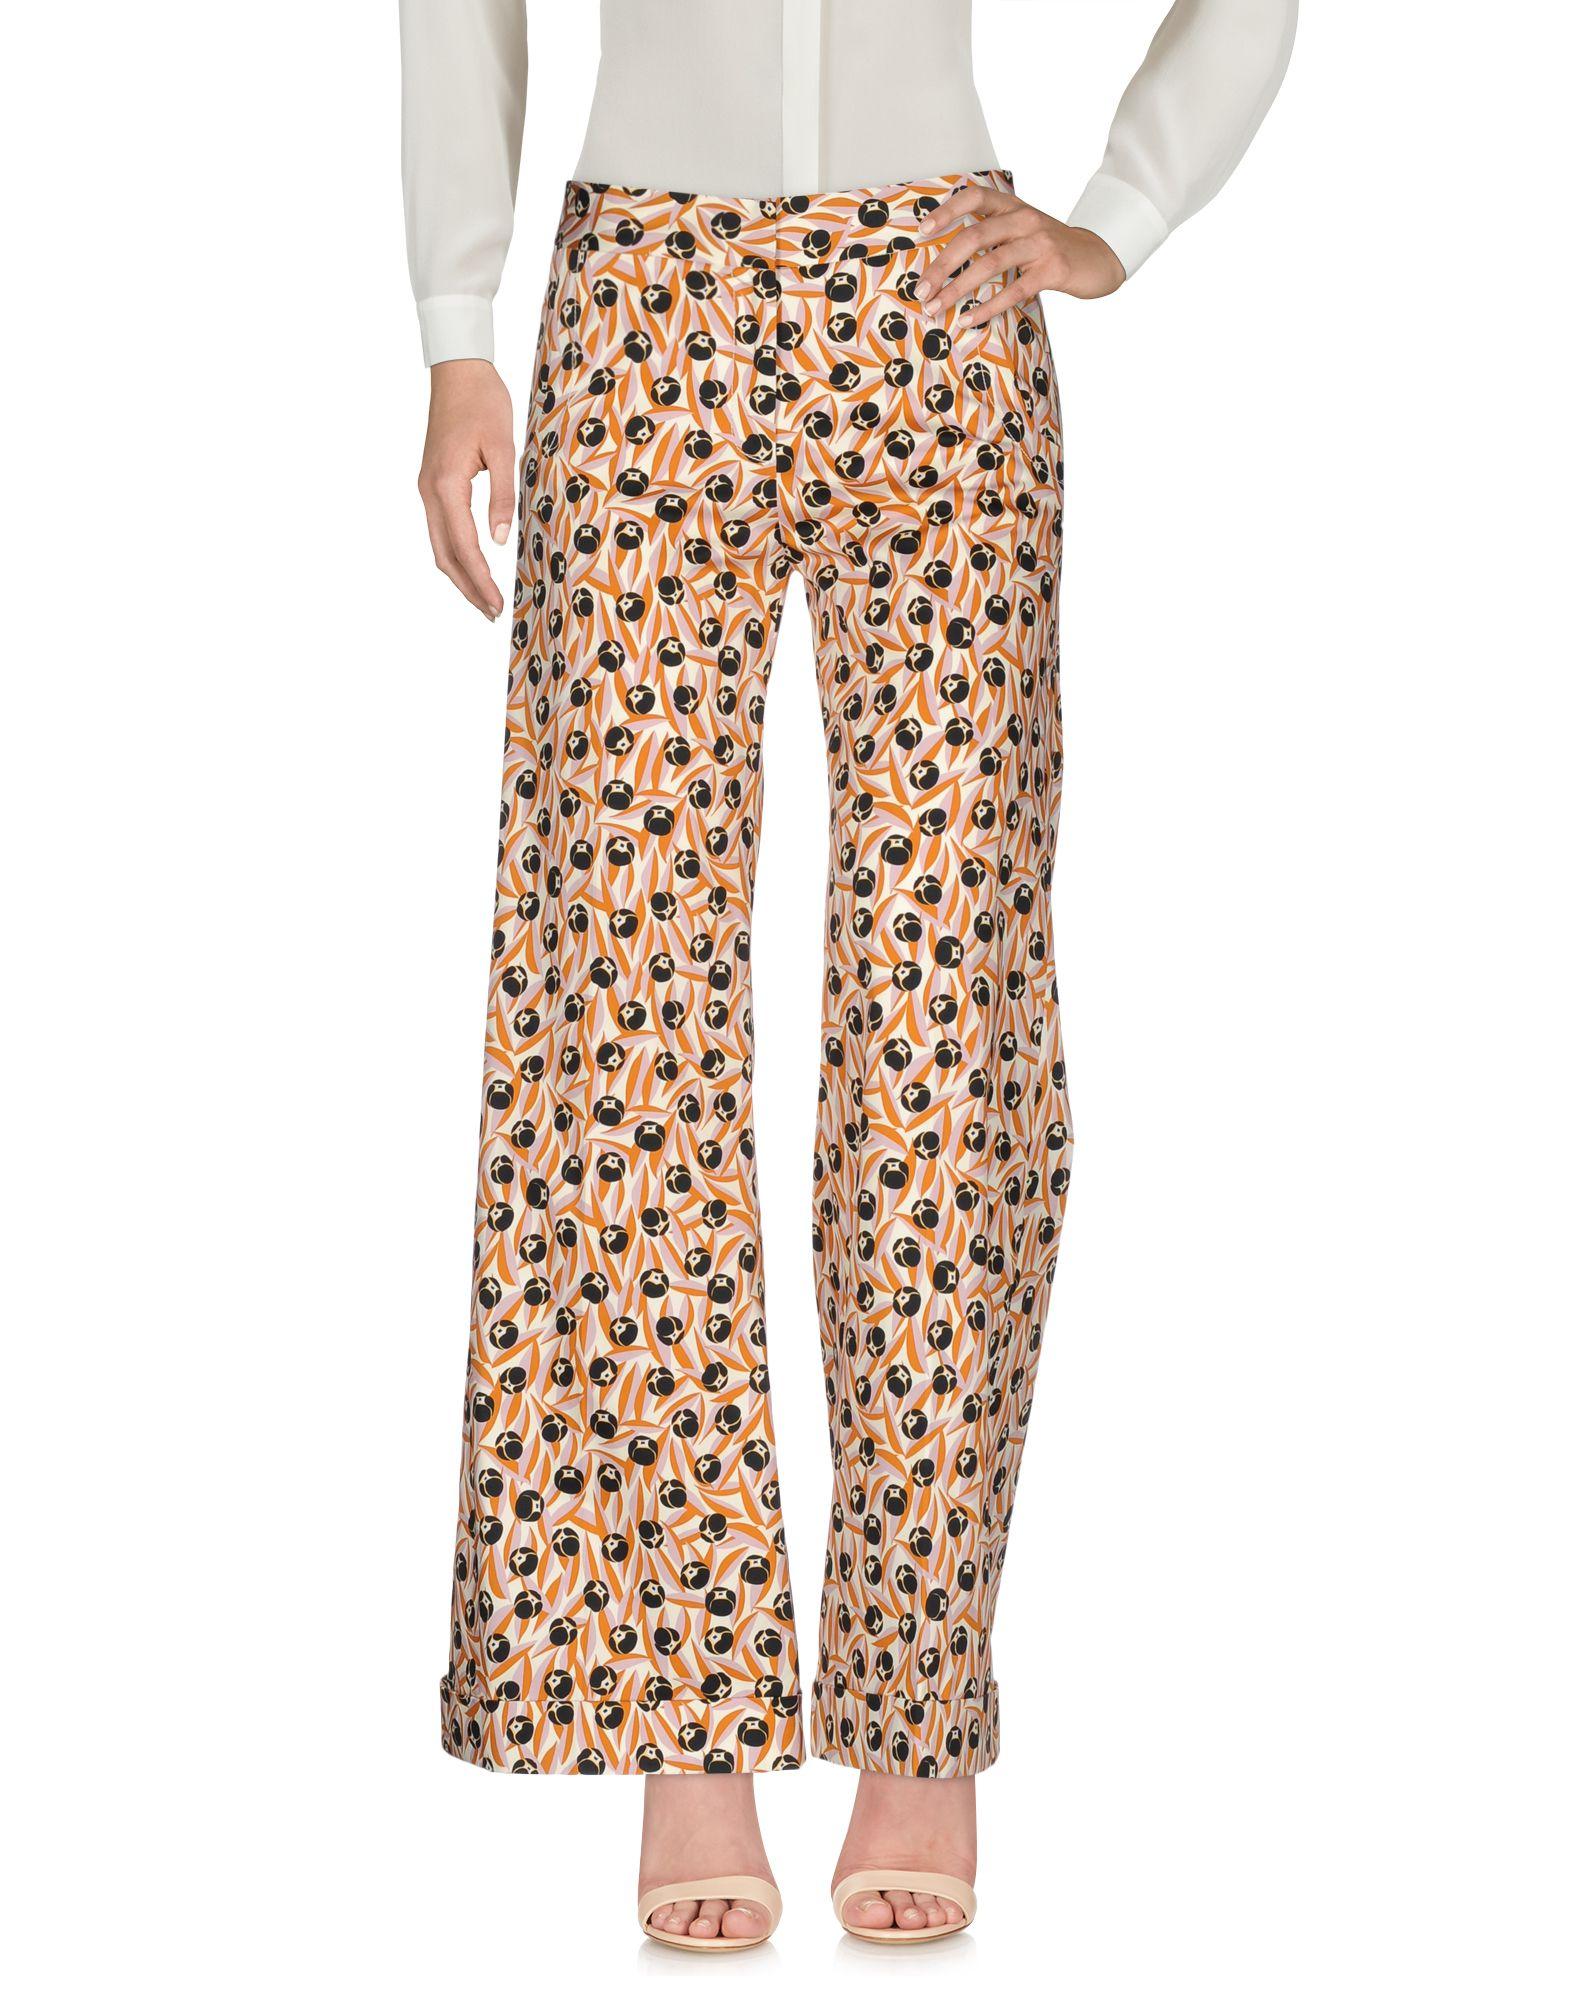 Pantalone Siyu Donna - Acquista online su tjcmuKfCpr